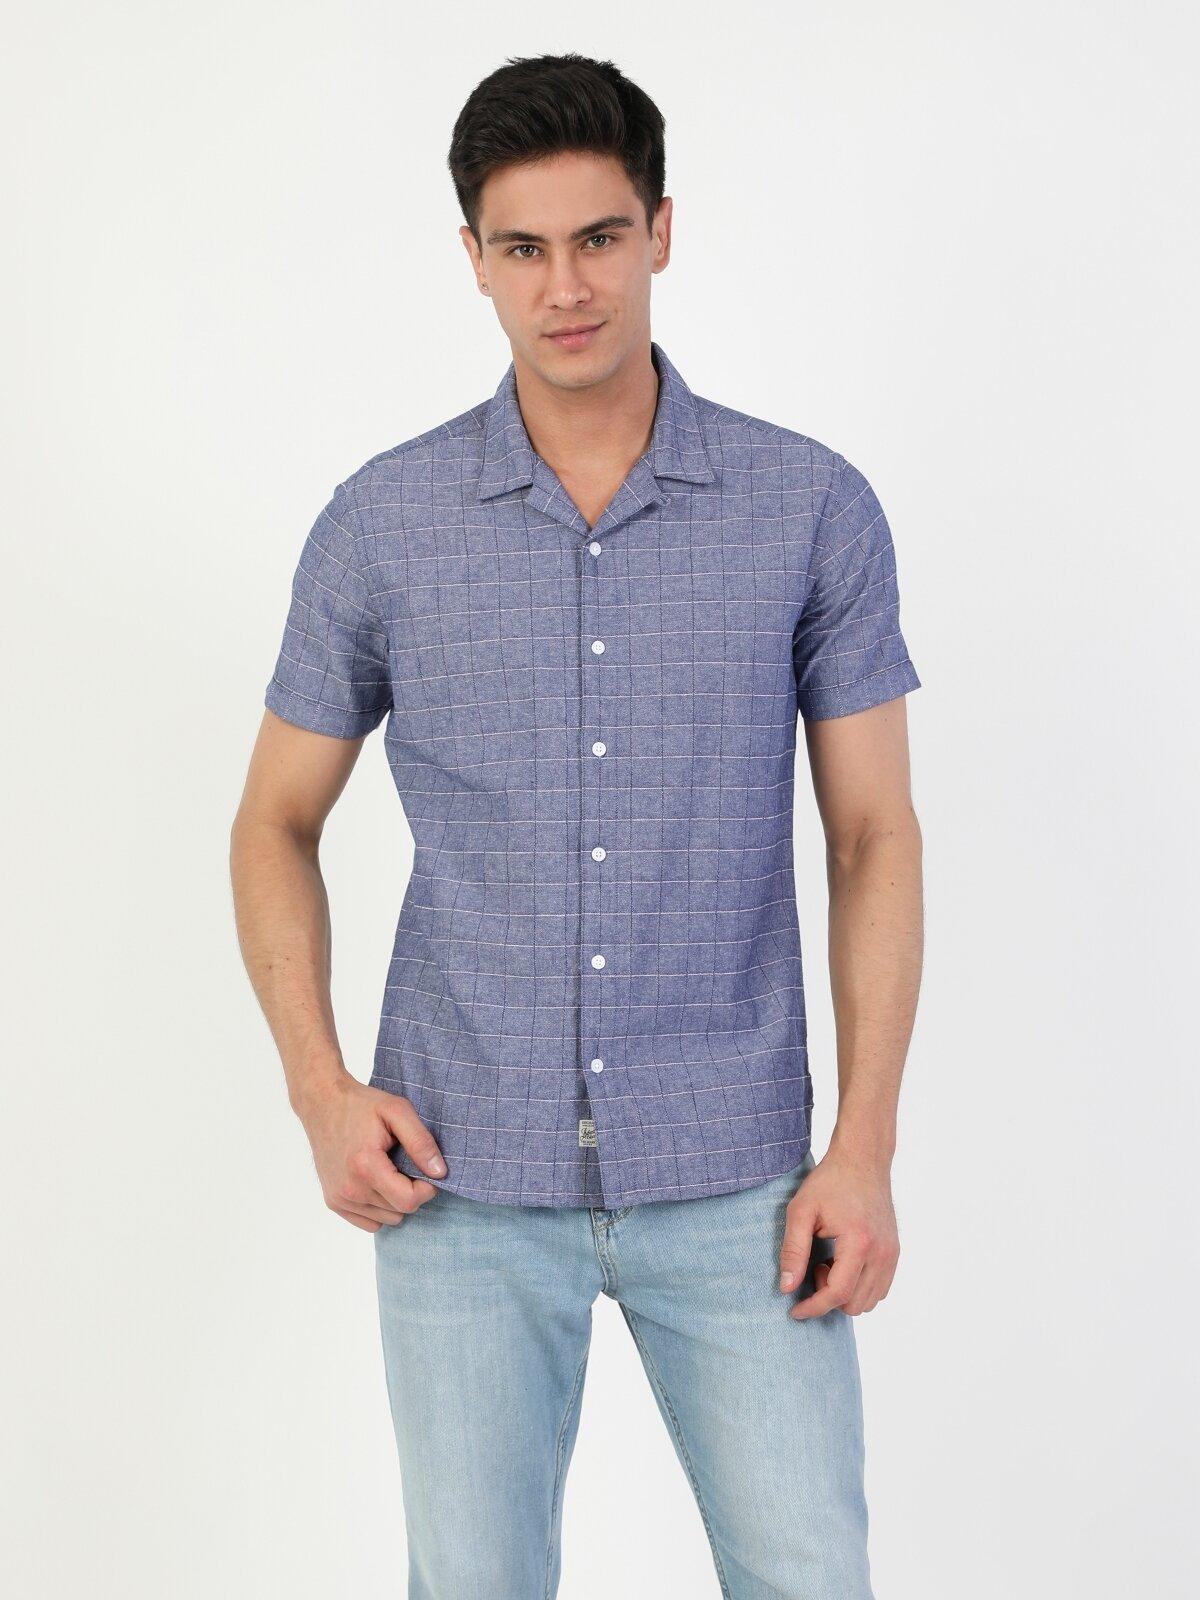 Slim Fit Shirt Neck Erkek Açık Mavi Kısa Kol Gömlek